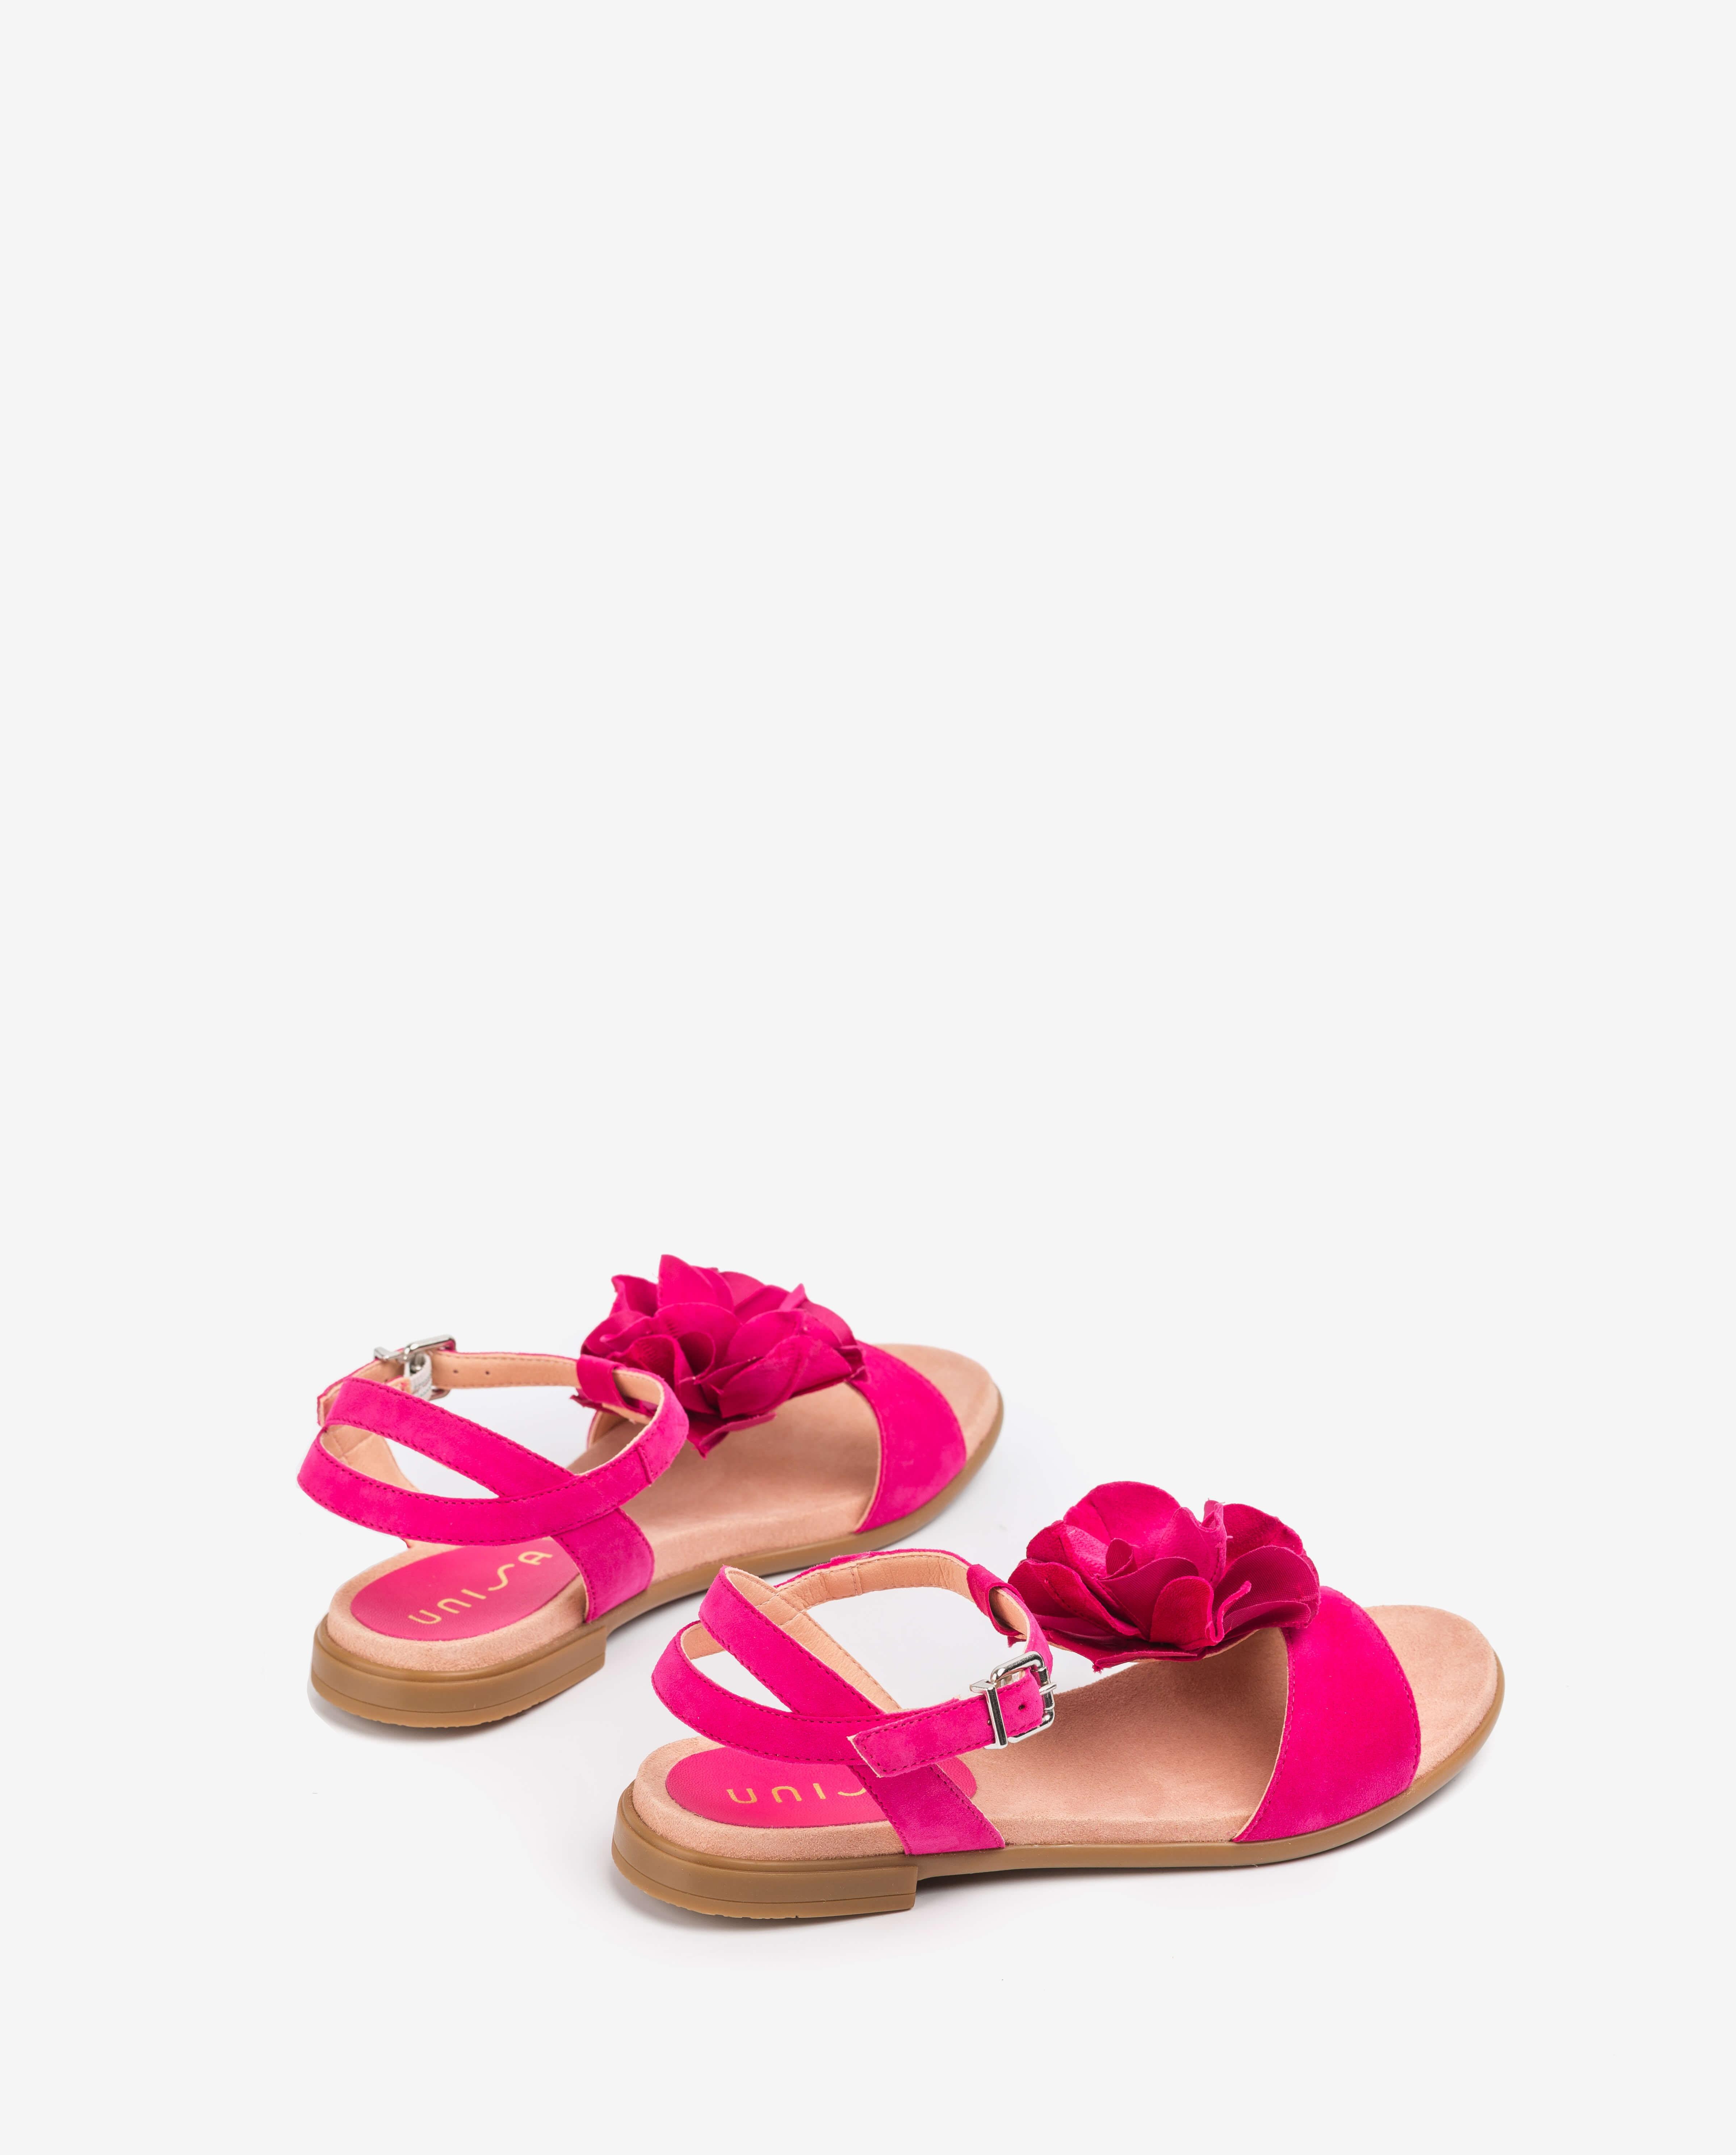 UNISA Fuchsiafarbene Mädchensandalen mit Blüte LUCK_C_KS fresia 5